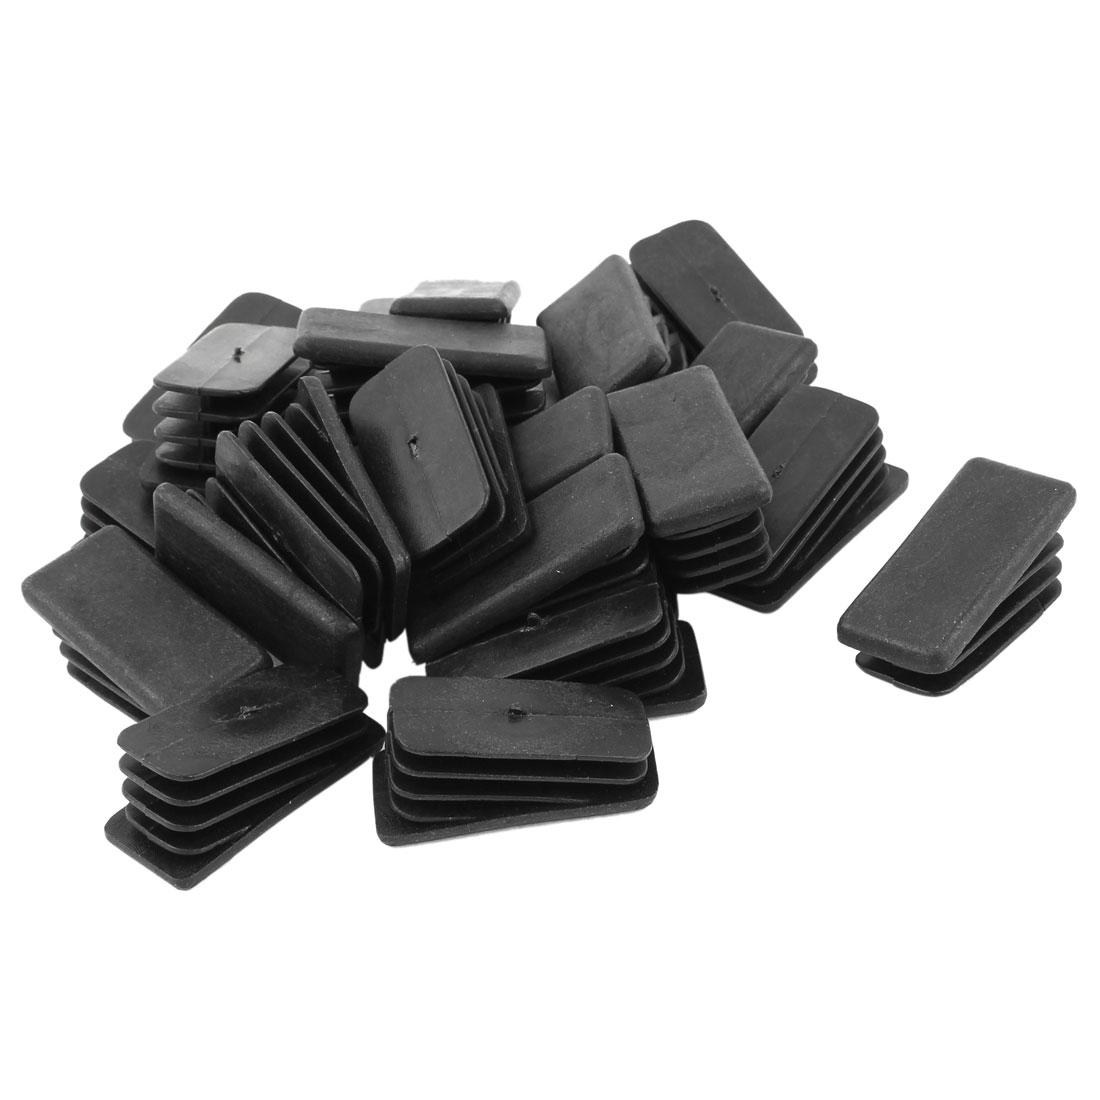 24 Pcs Black Plastic 20mm x 40mm Slope Tubing Tube Insert Pads Caps Covers